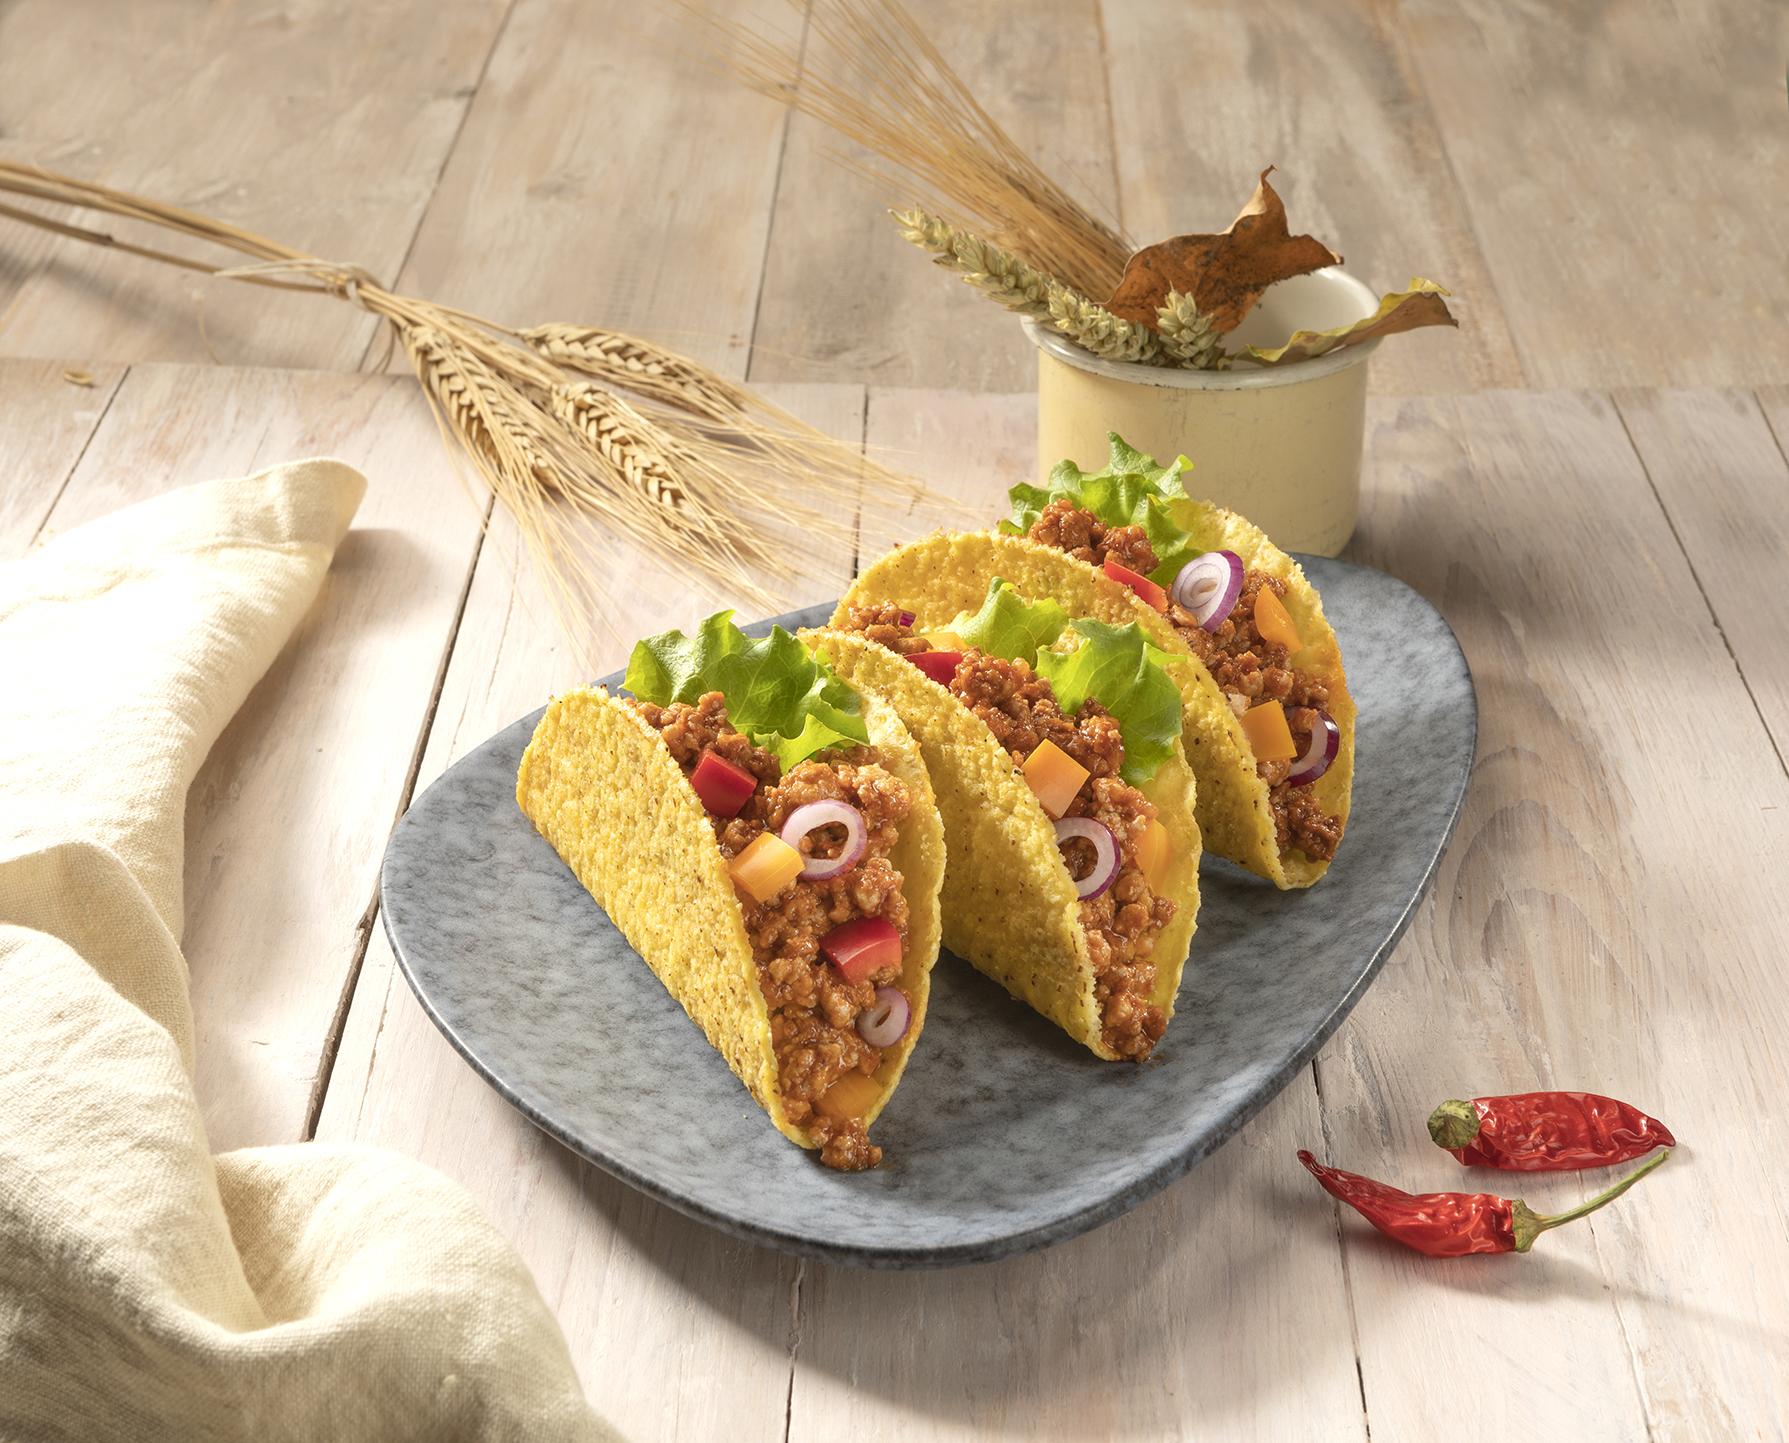 Tortillas croccanti con ragù, peperoni e cipolla